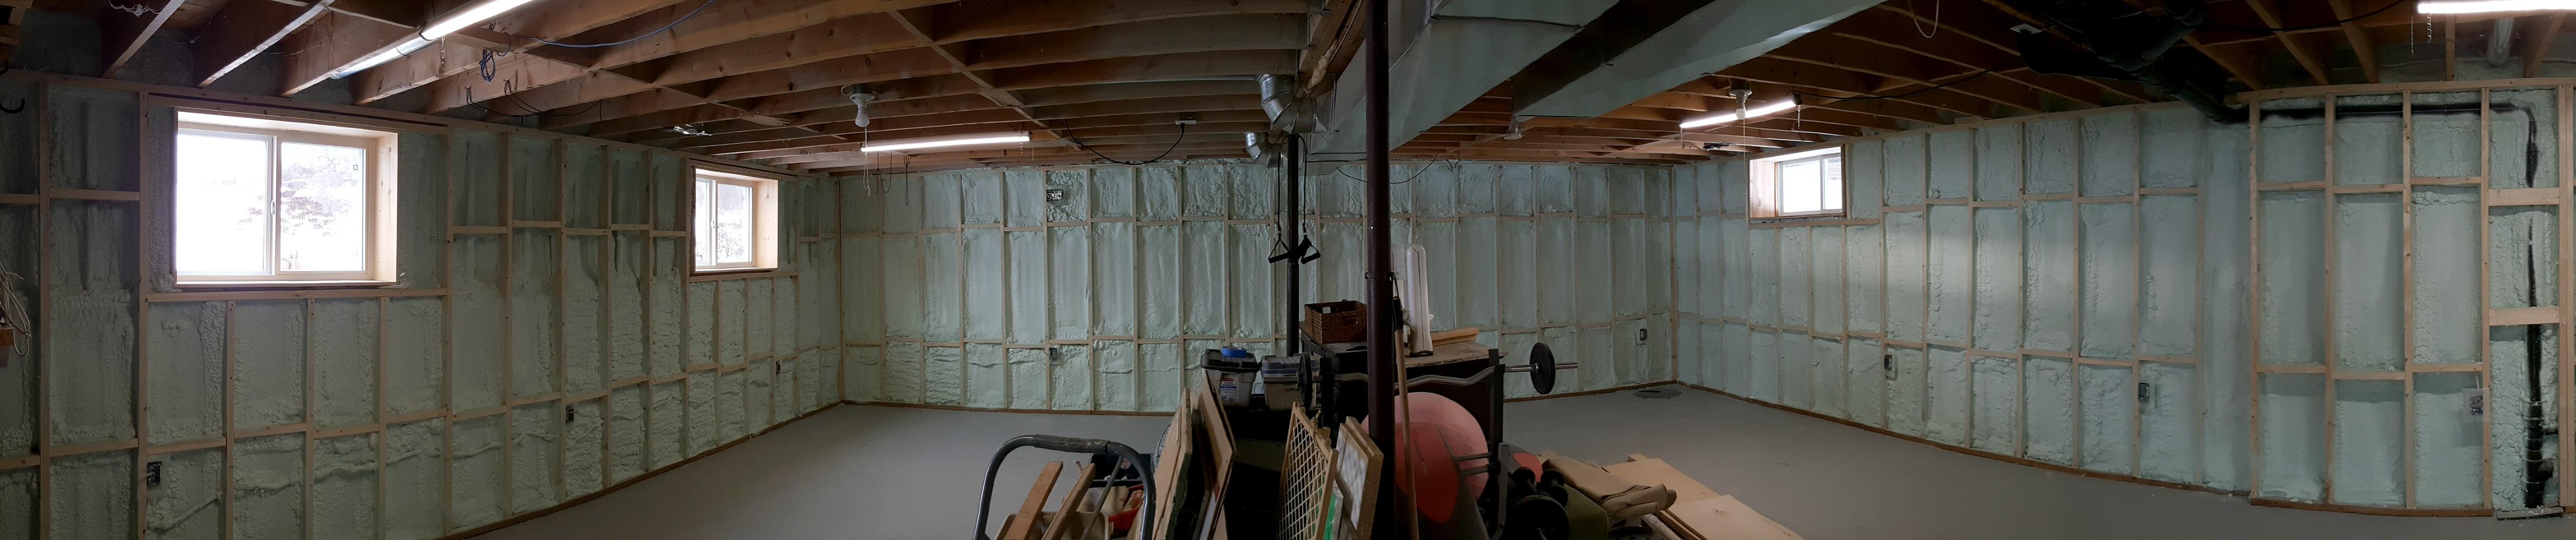 basement framing and spray foam insulation